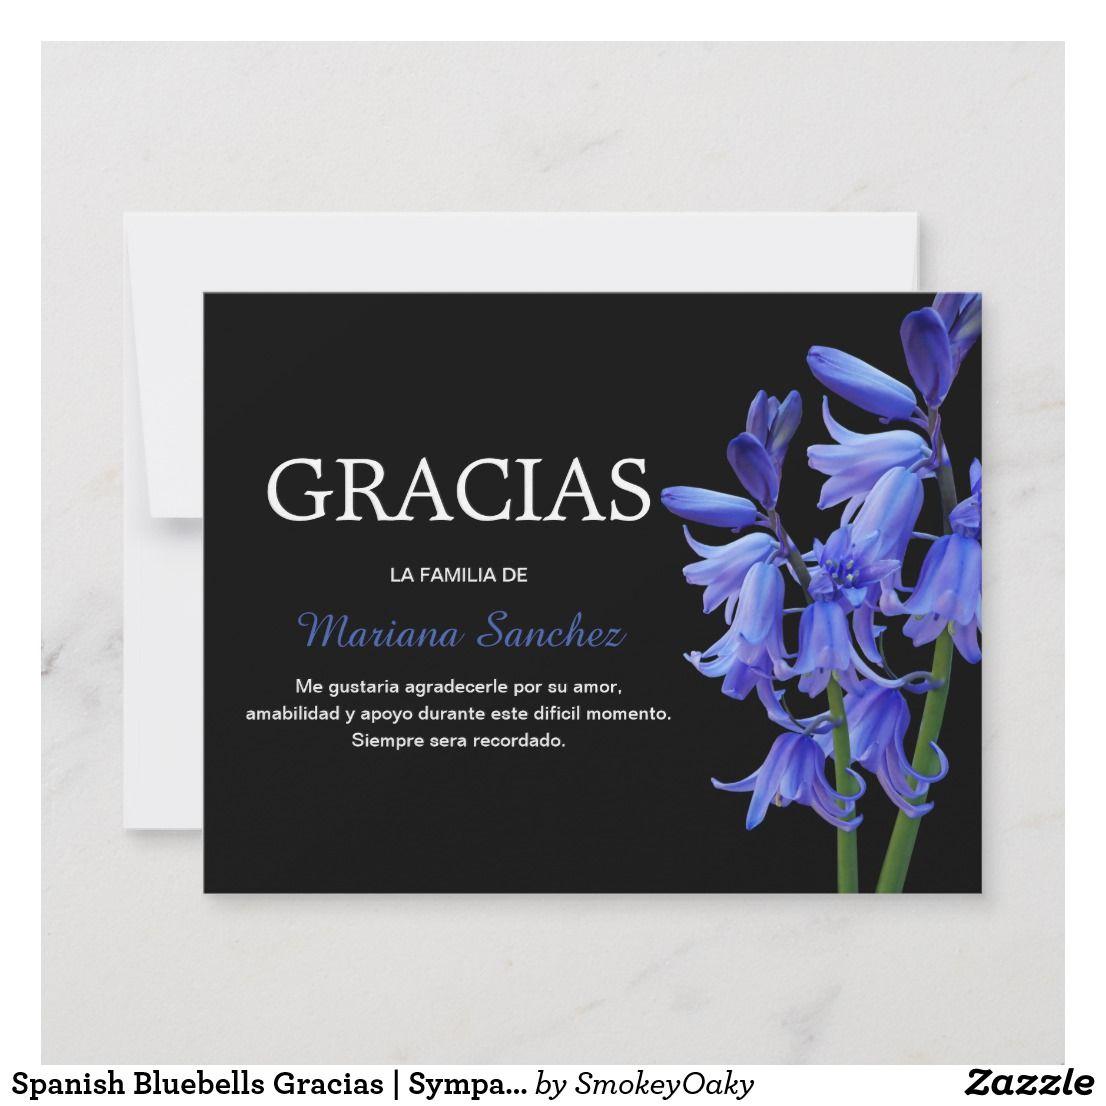 spanish bluebells gracias  sympathy thank you  zazzle